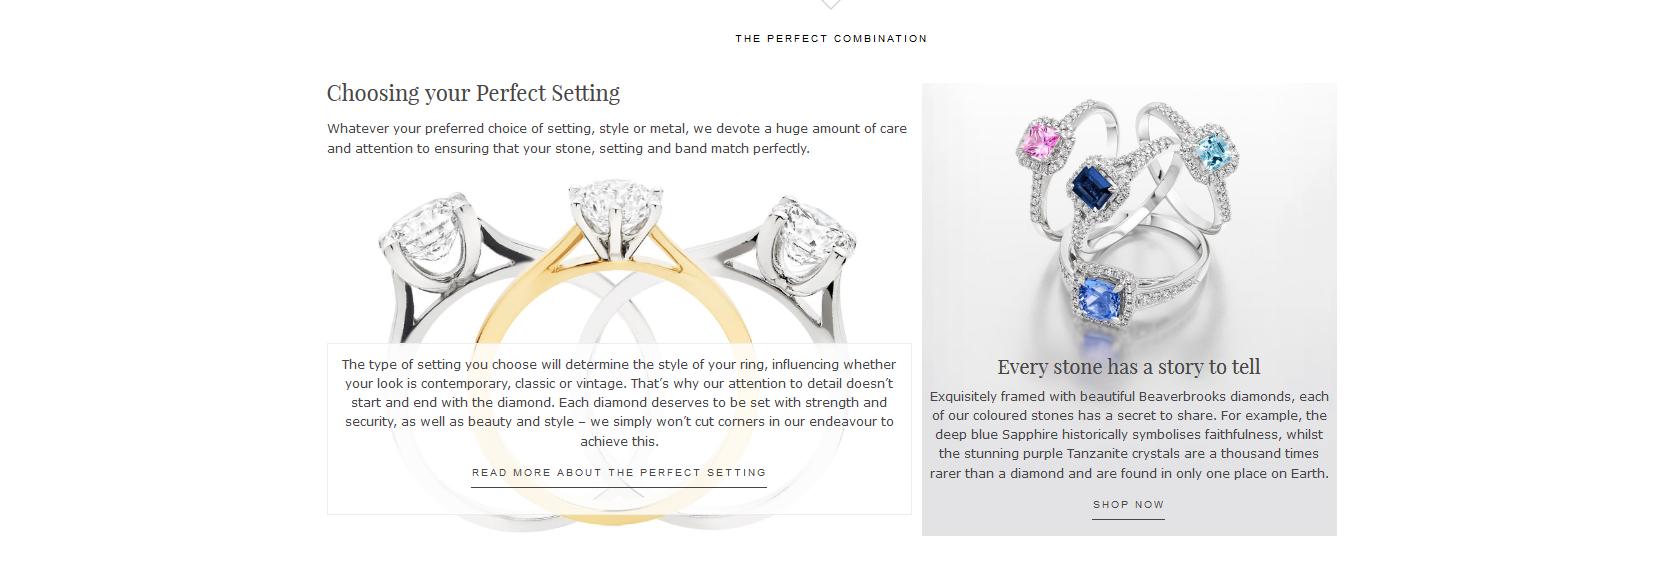 02a700bf7 Screenshot-2018-2-3 Diamond Buying Guide Beaverbrooks the Jewellers(4)